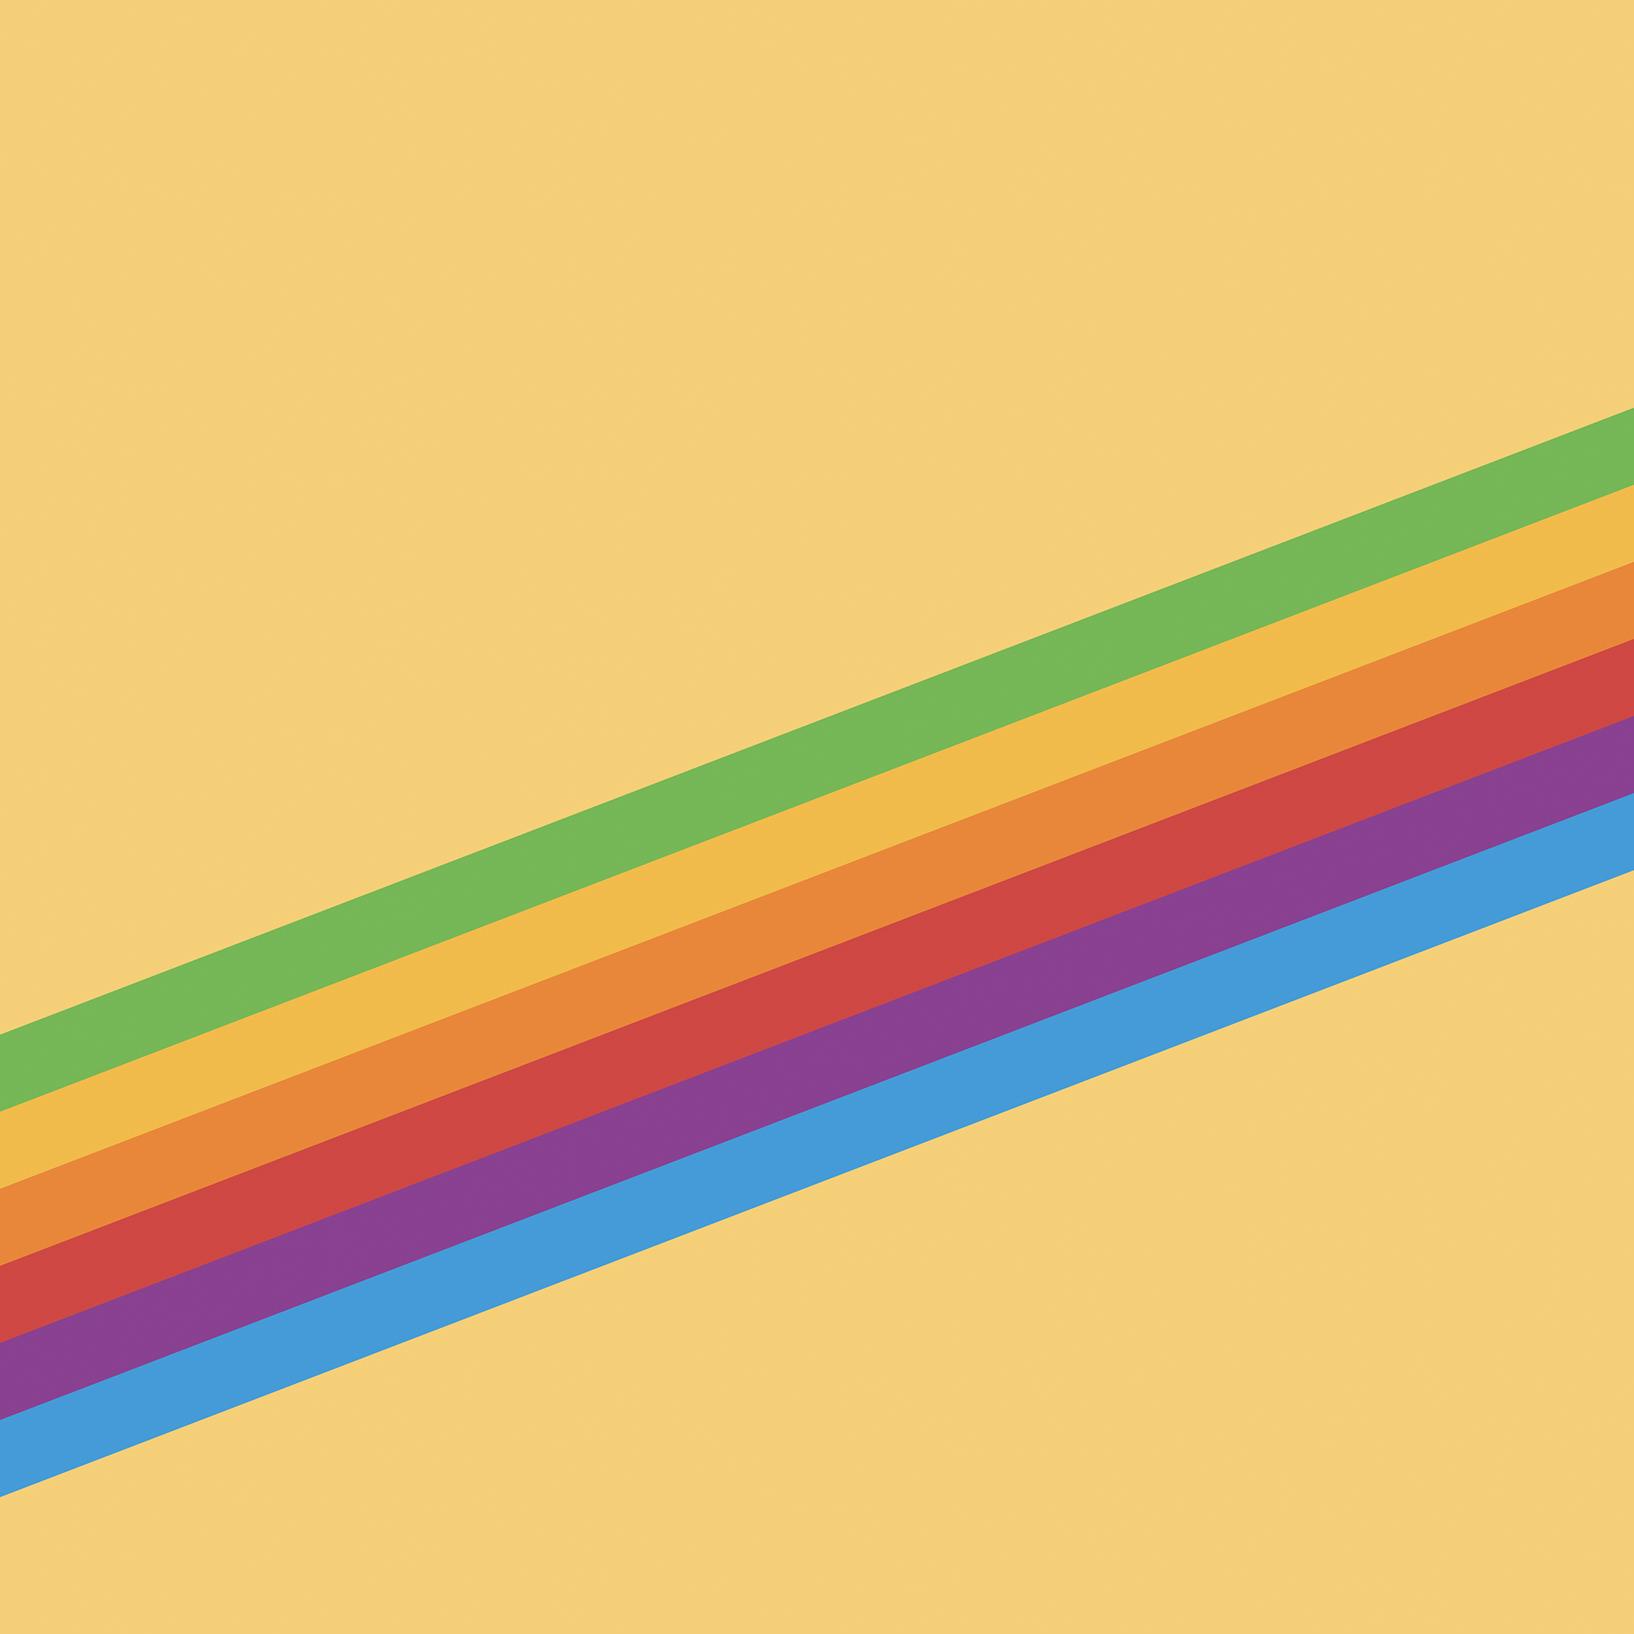 iOS_11_GM_Wallpaper_Heritage_Stripe_Yellow